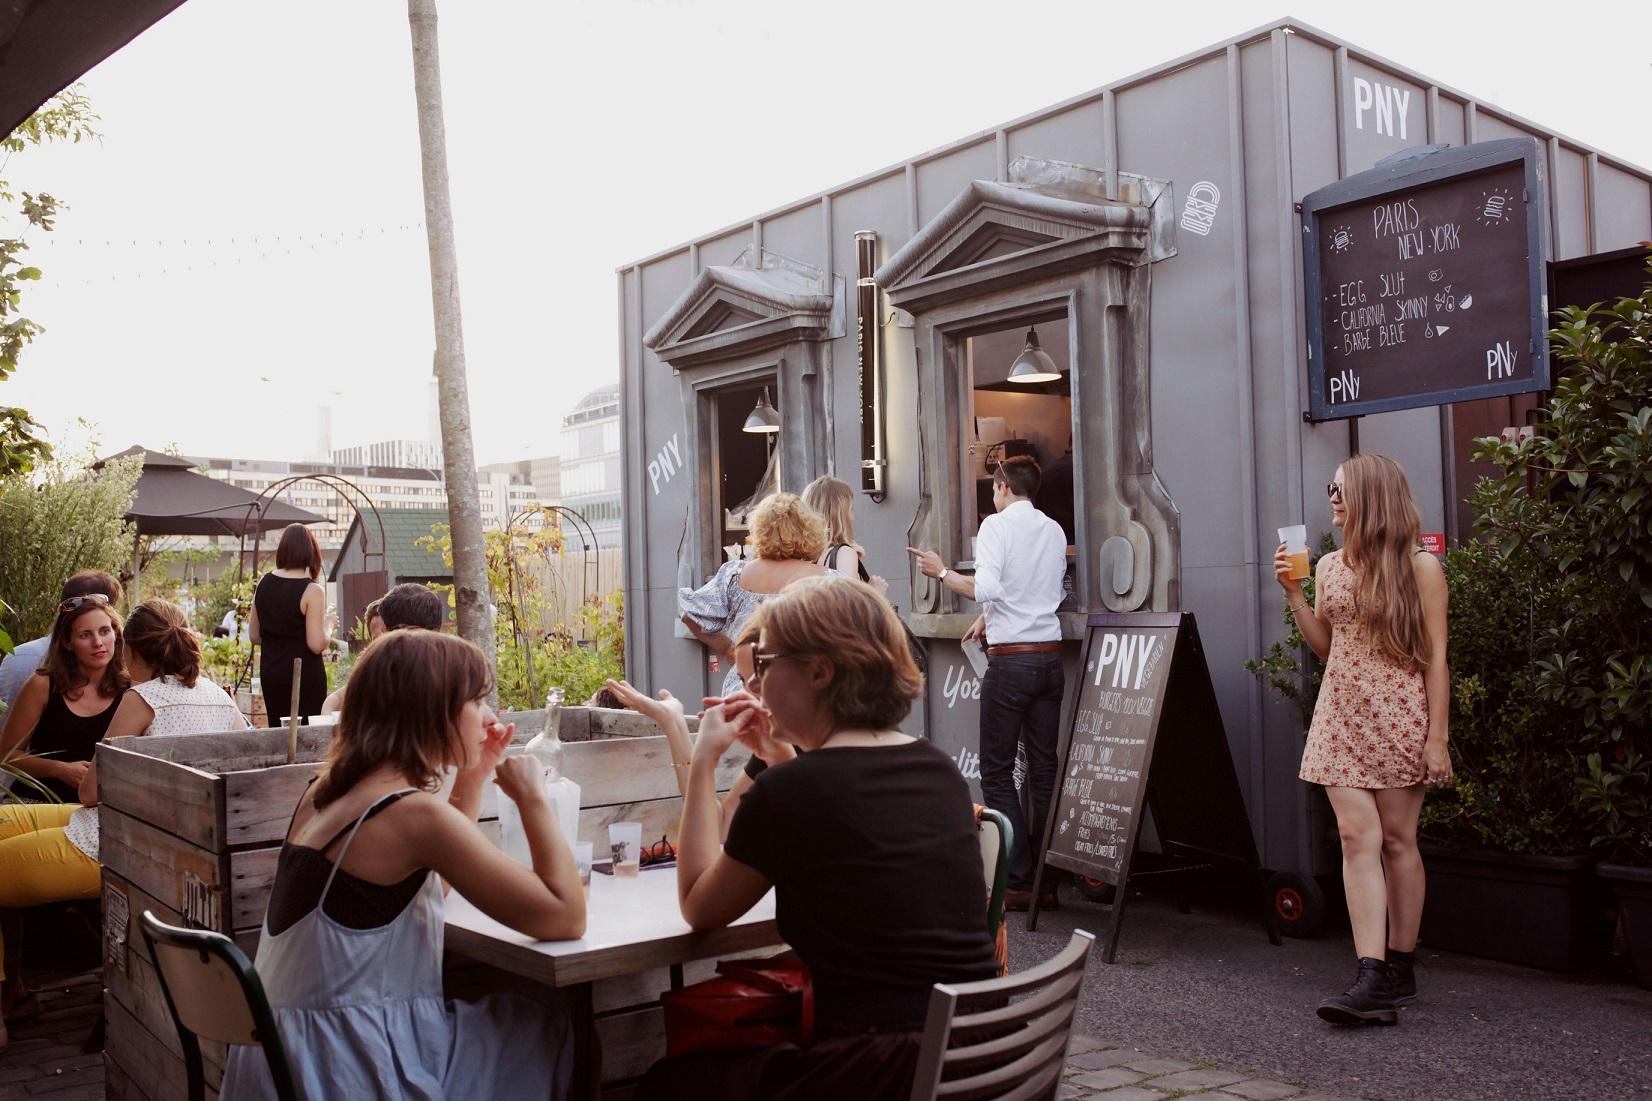 Cheap Eats in Paris - Street Food Markets